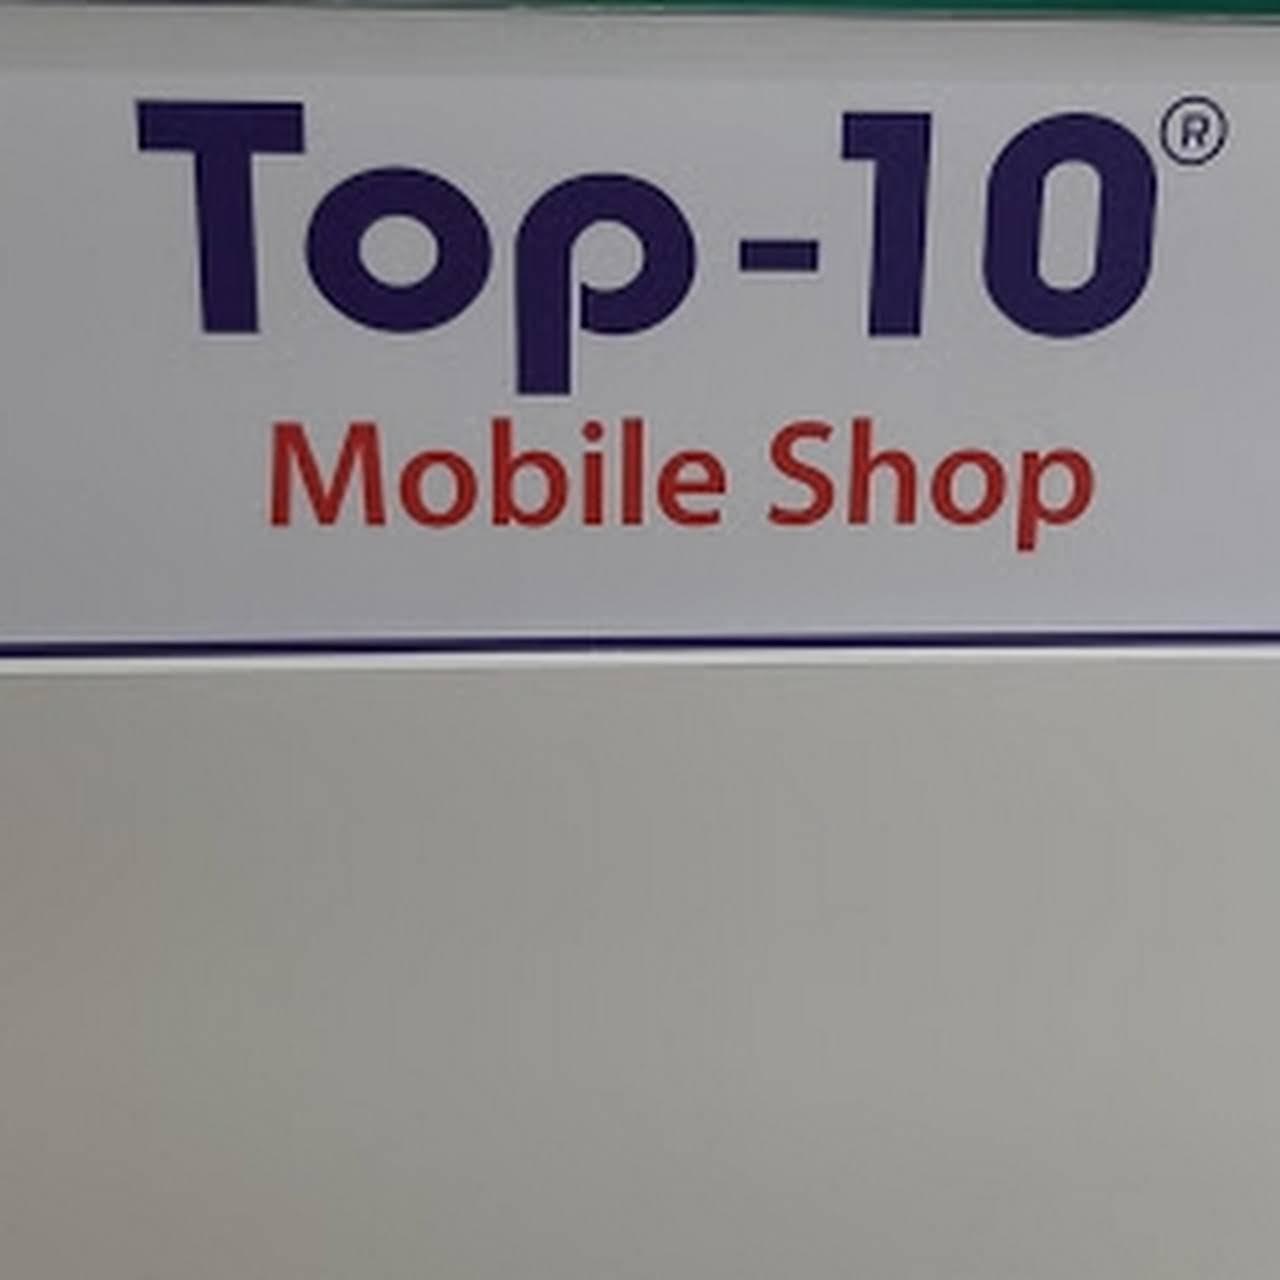 Parth Telecom Top 10 Mobile Shop - Repair Service in Thane